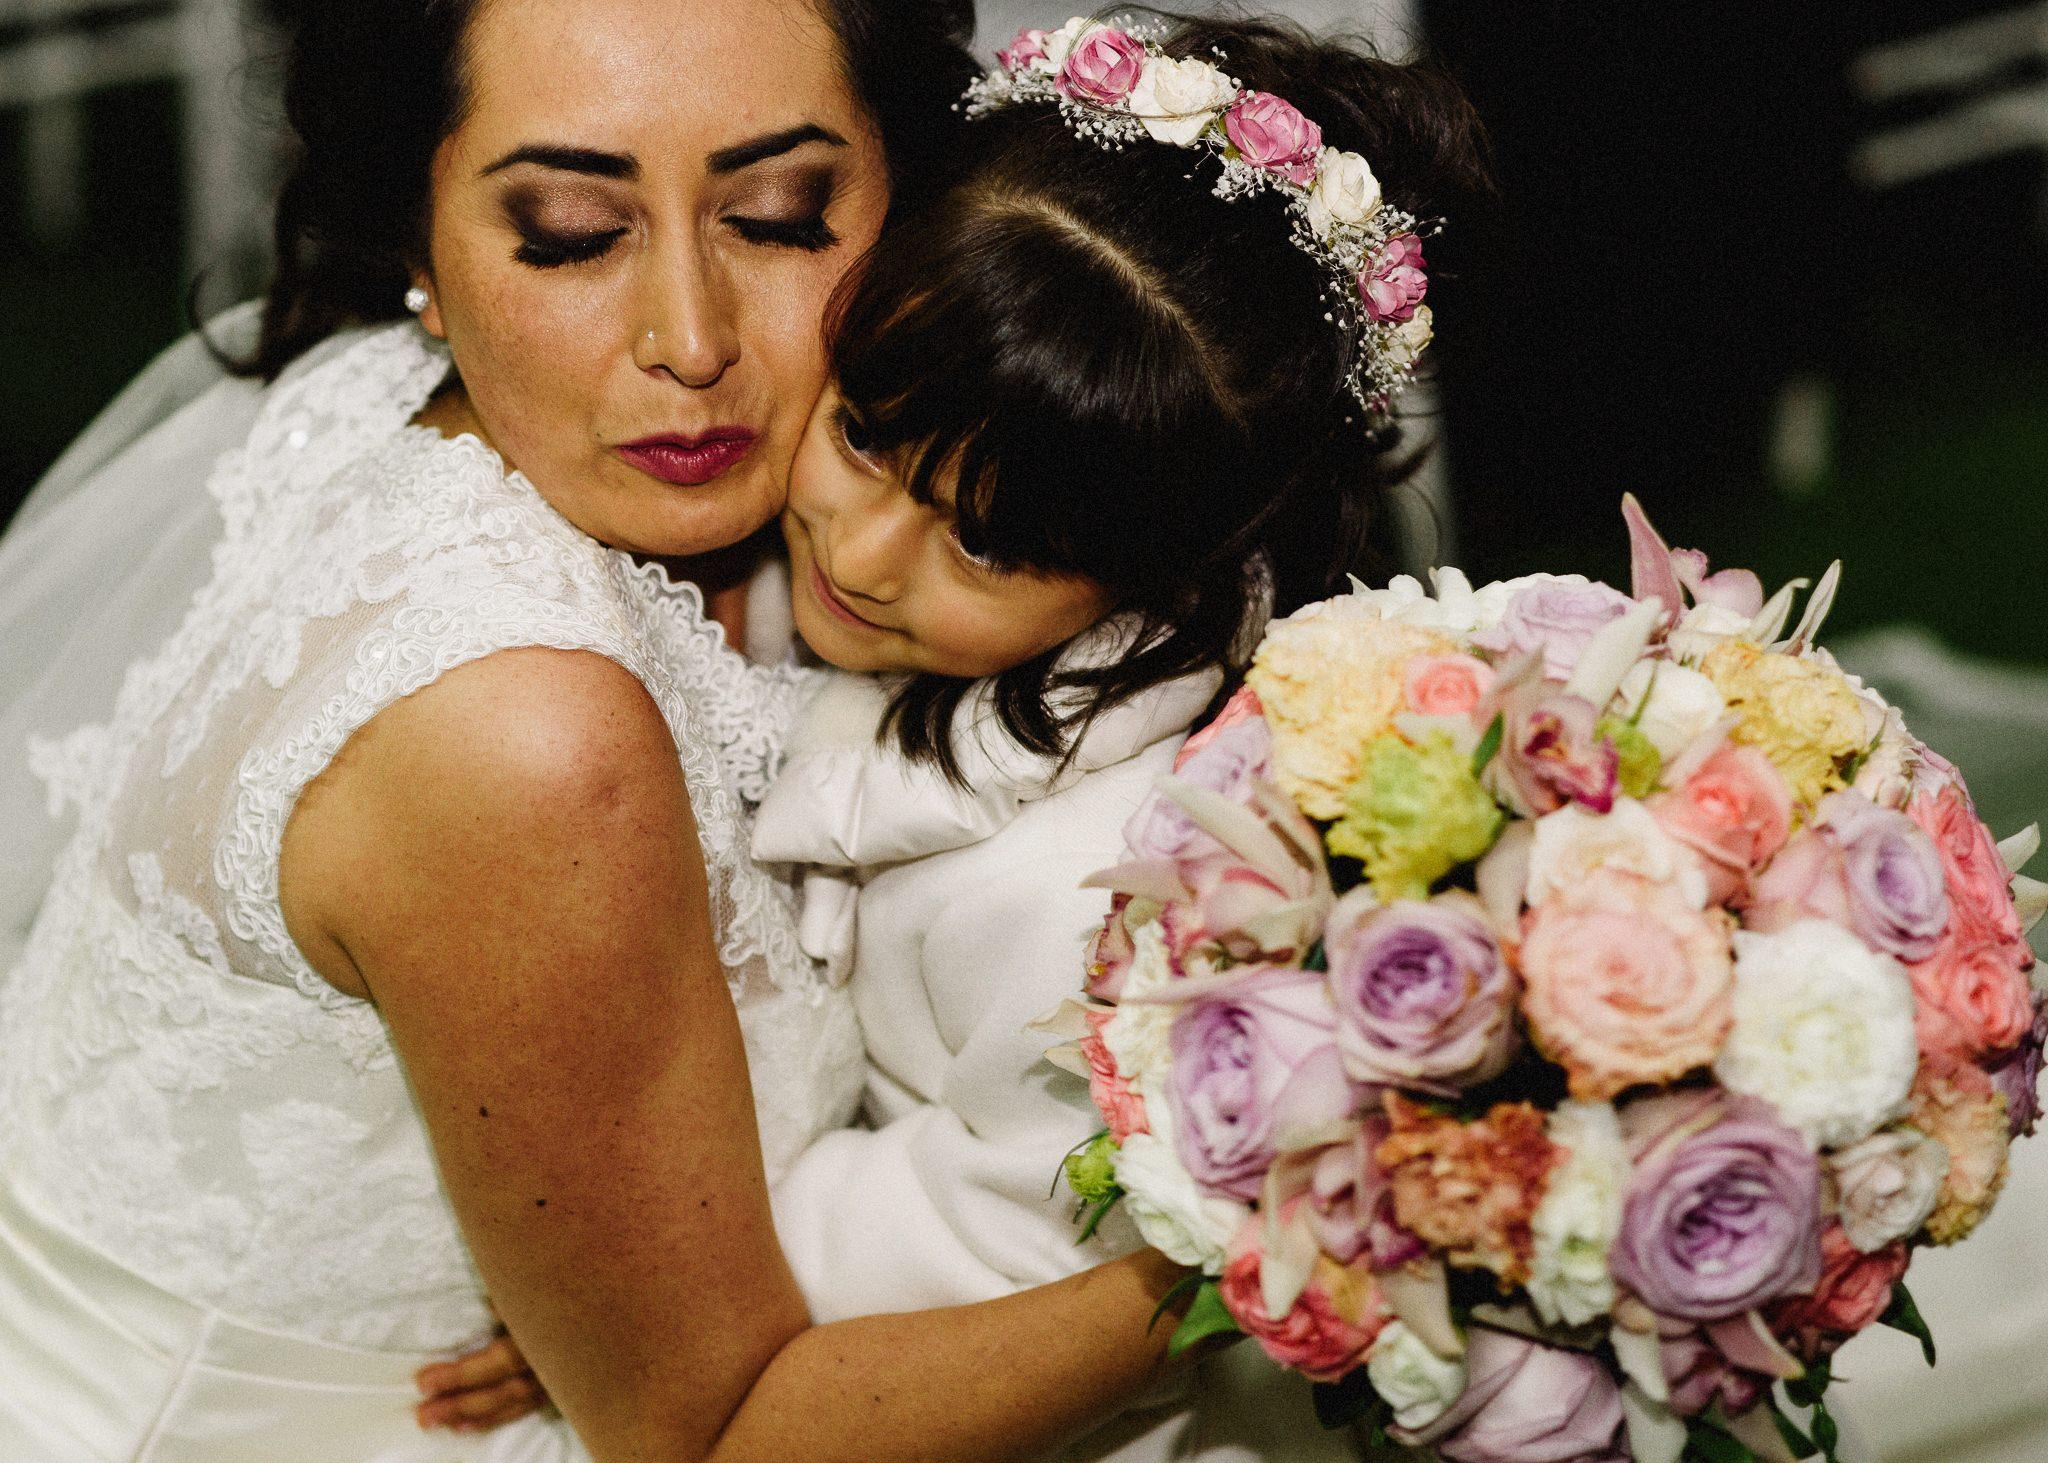 Wedding-Boda-Tulancingo-Hidalgo-Salon-Essenzia-Luis-Houdin-41-film